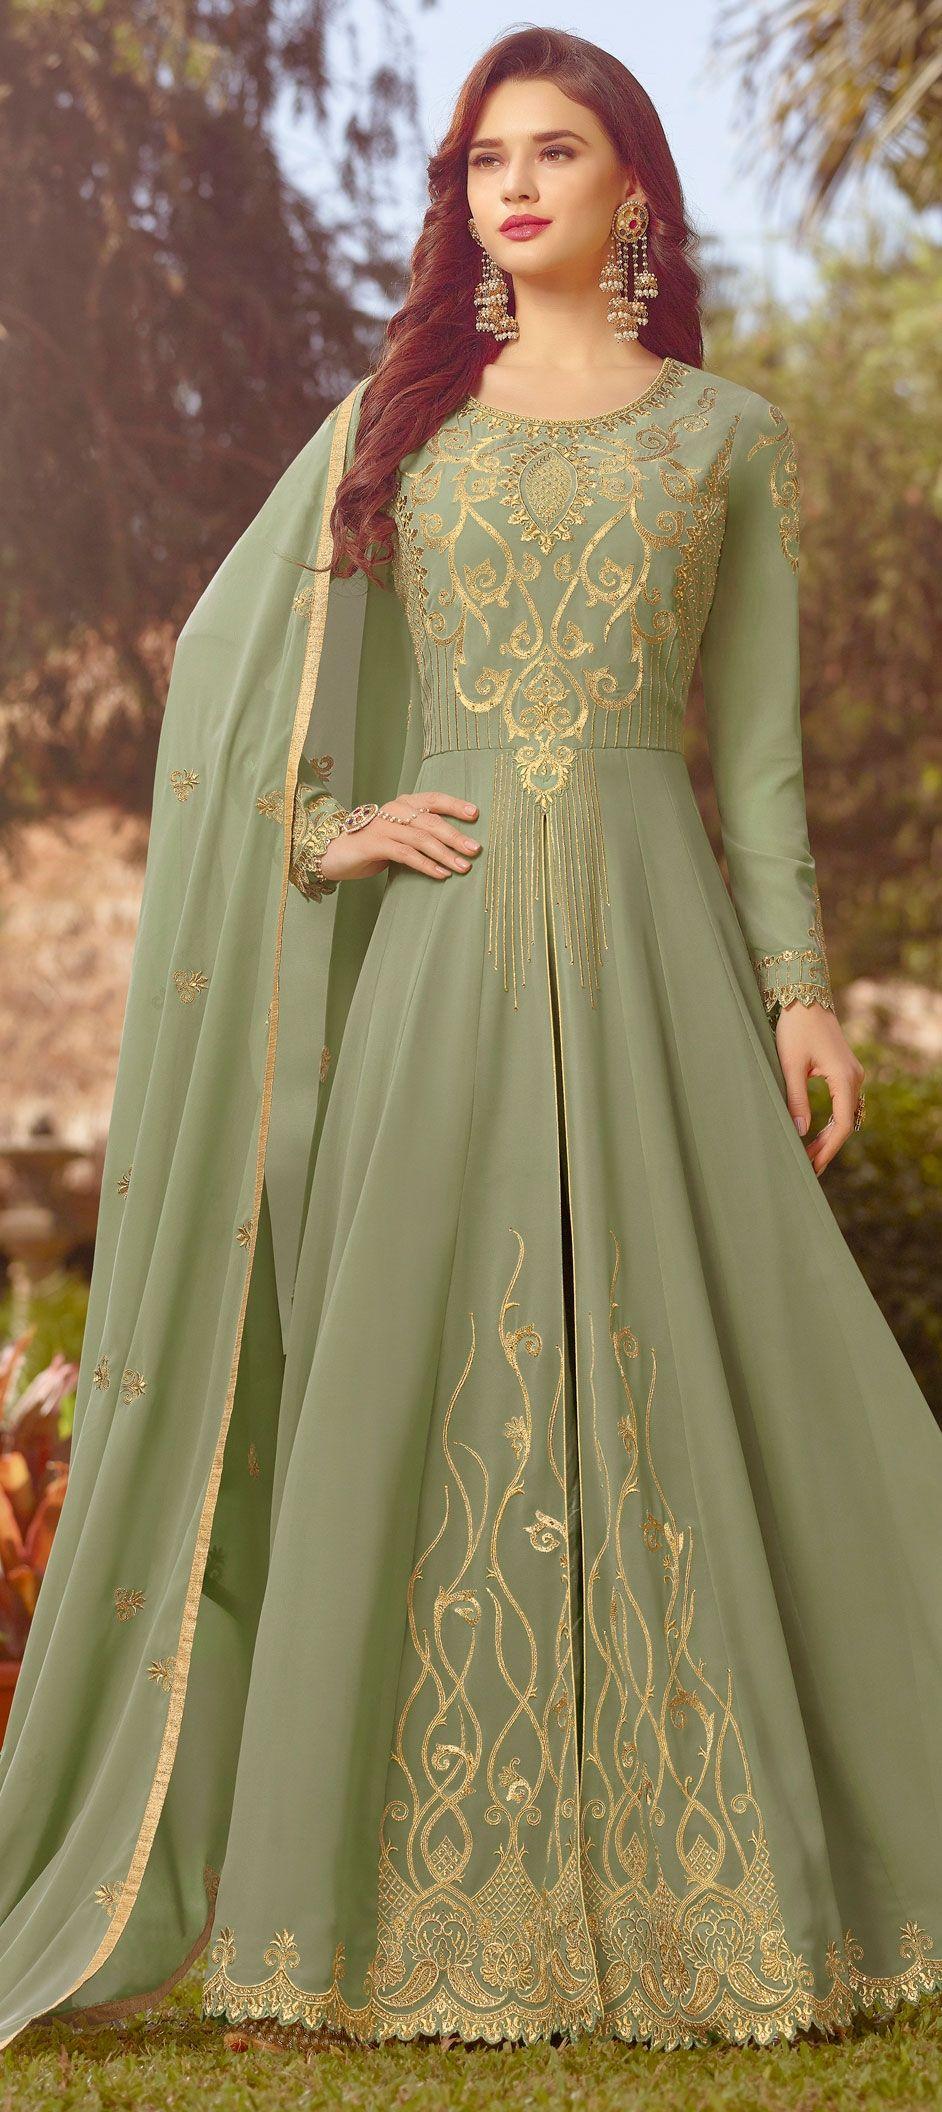 b160e4c6e5 1548651: Party Wear Green color Georgette fabric Salwar Kameez